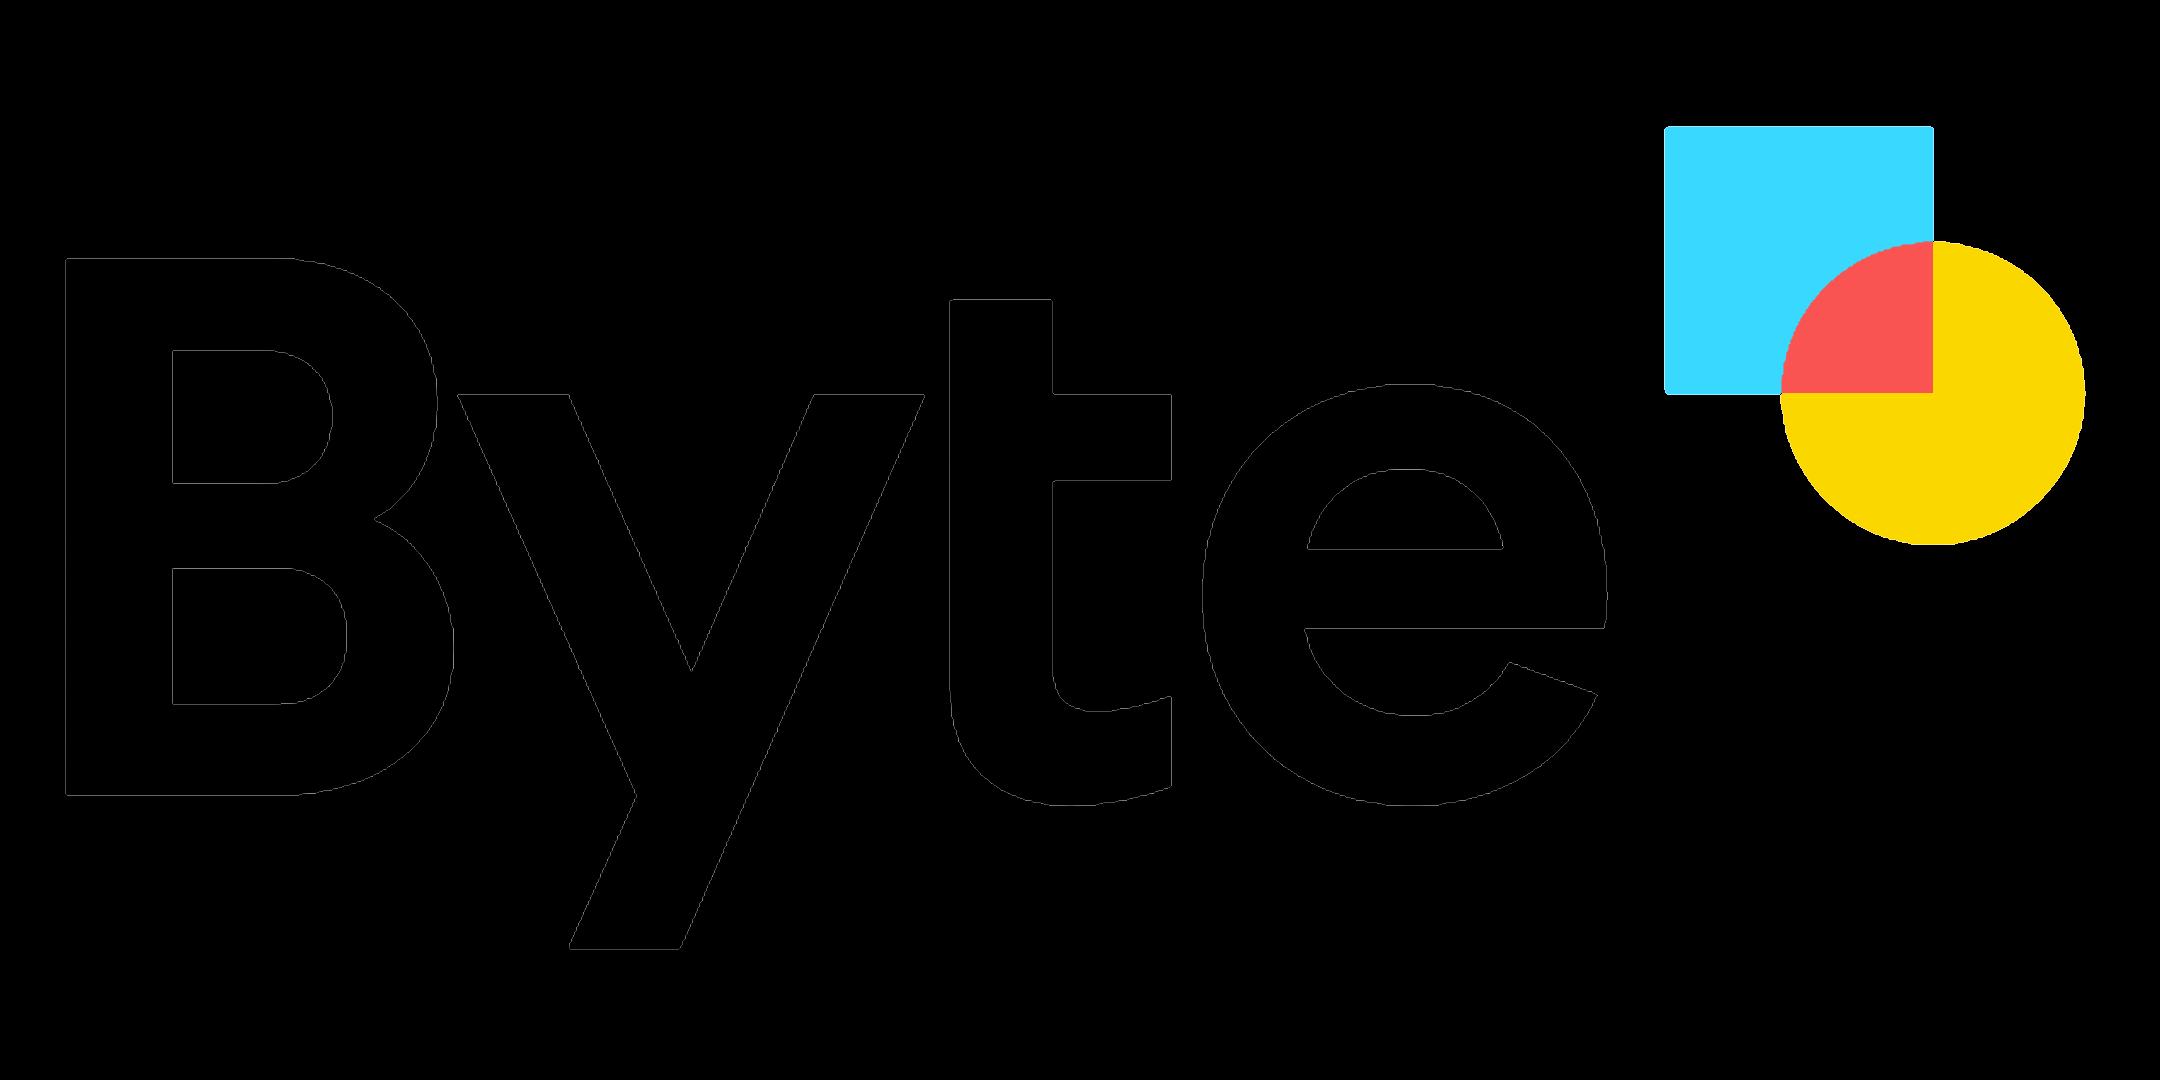 Byte (social media)